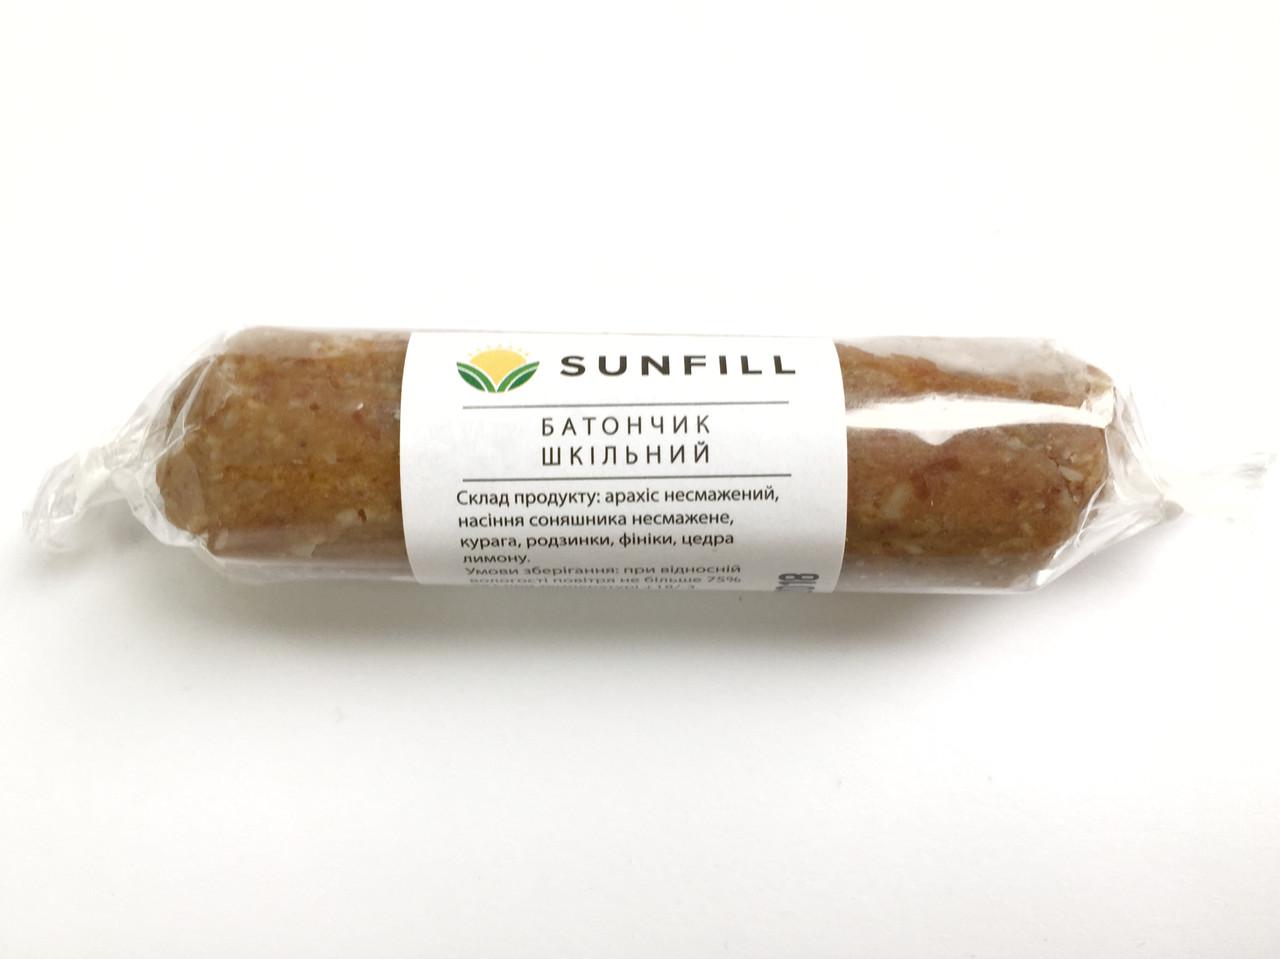 Батончик с арахисом и курагой Sunfill, 50г